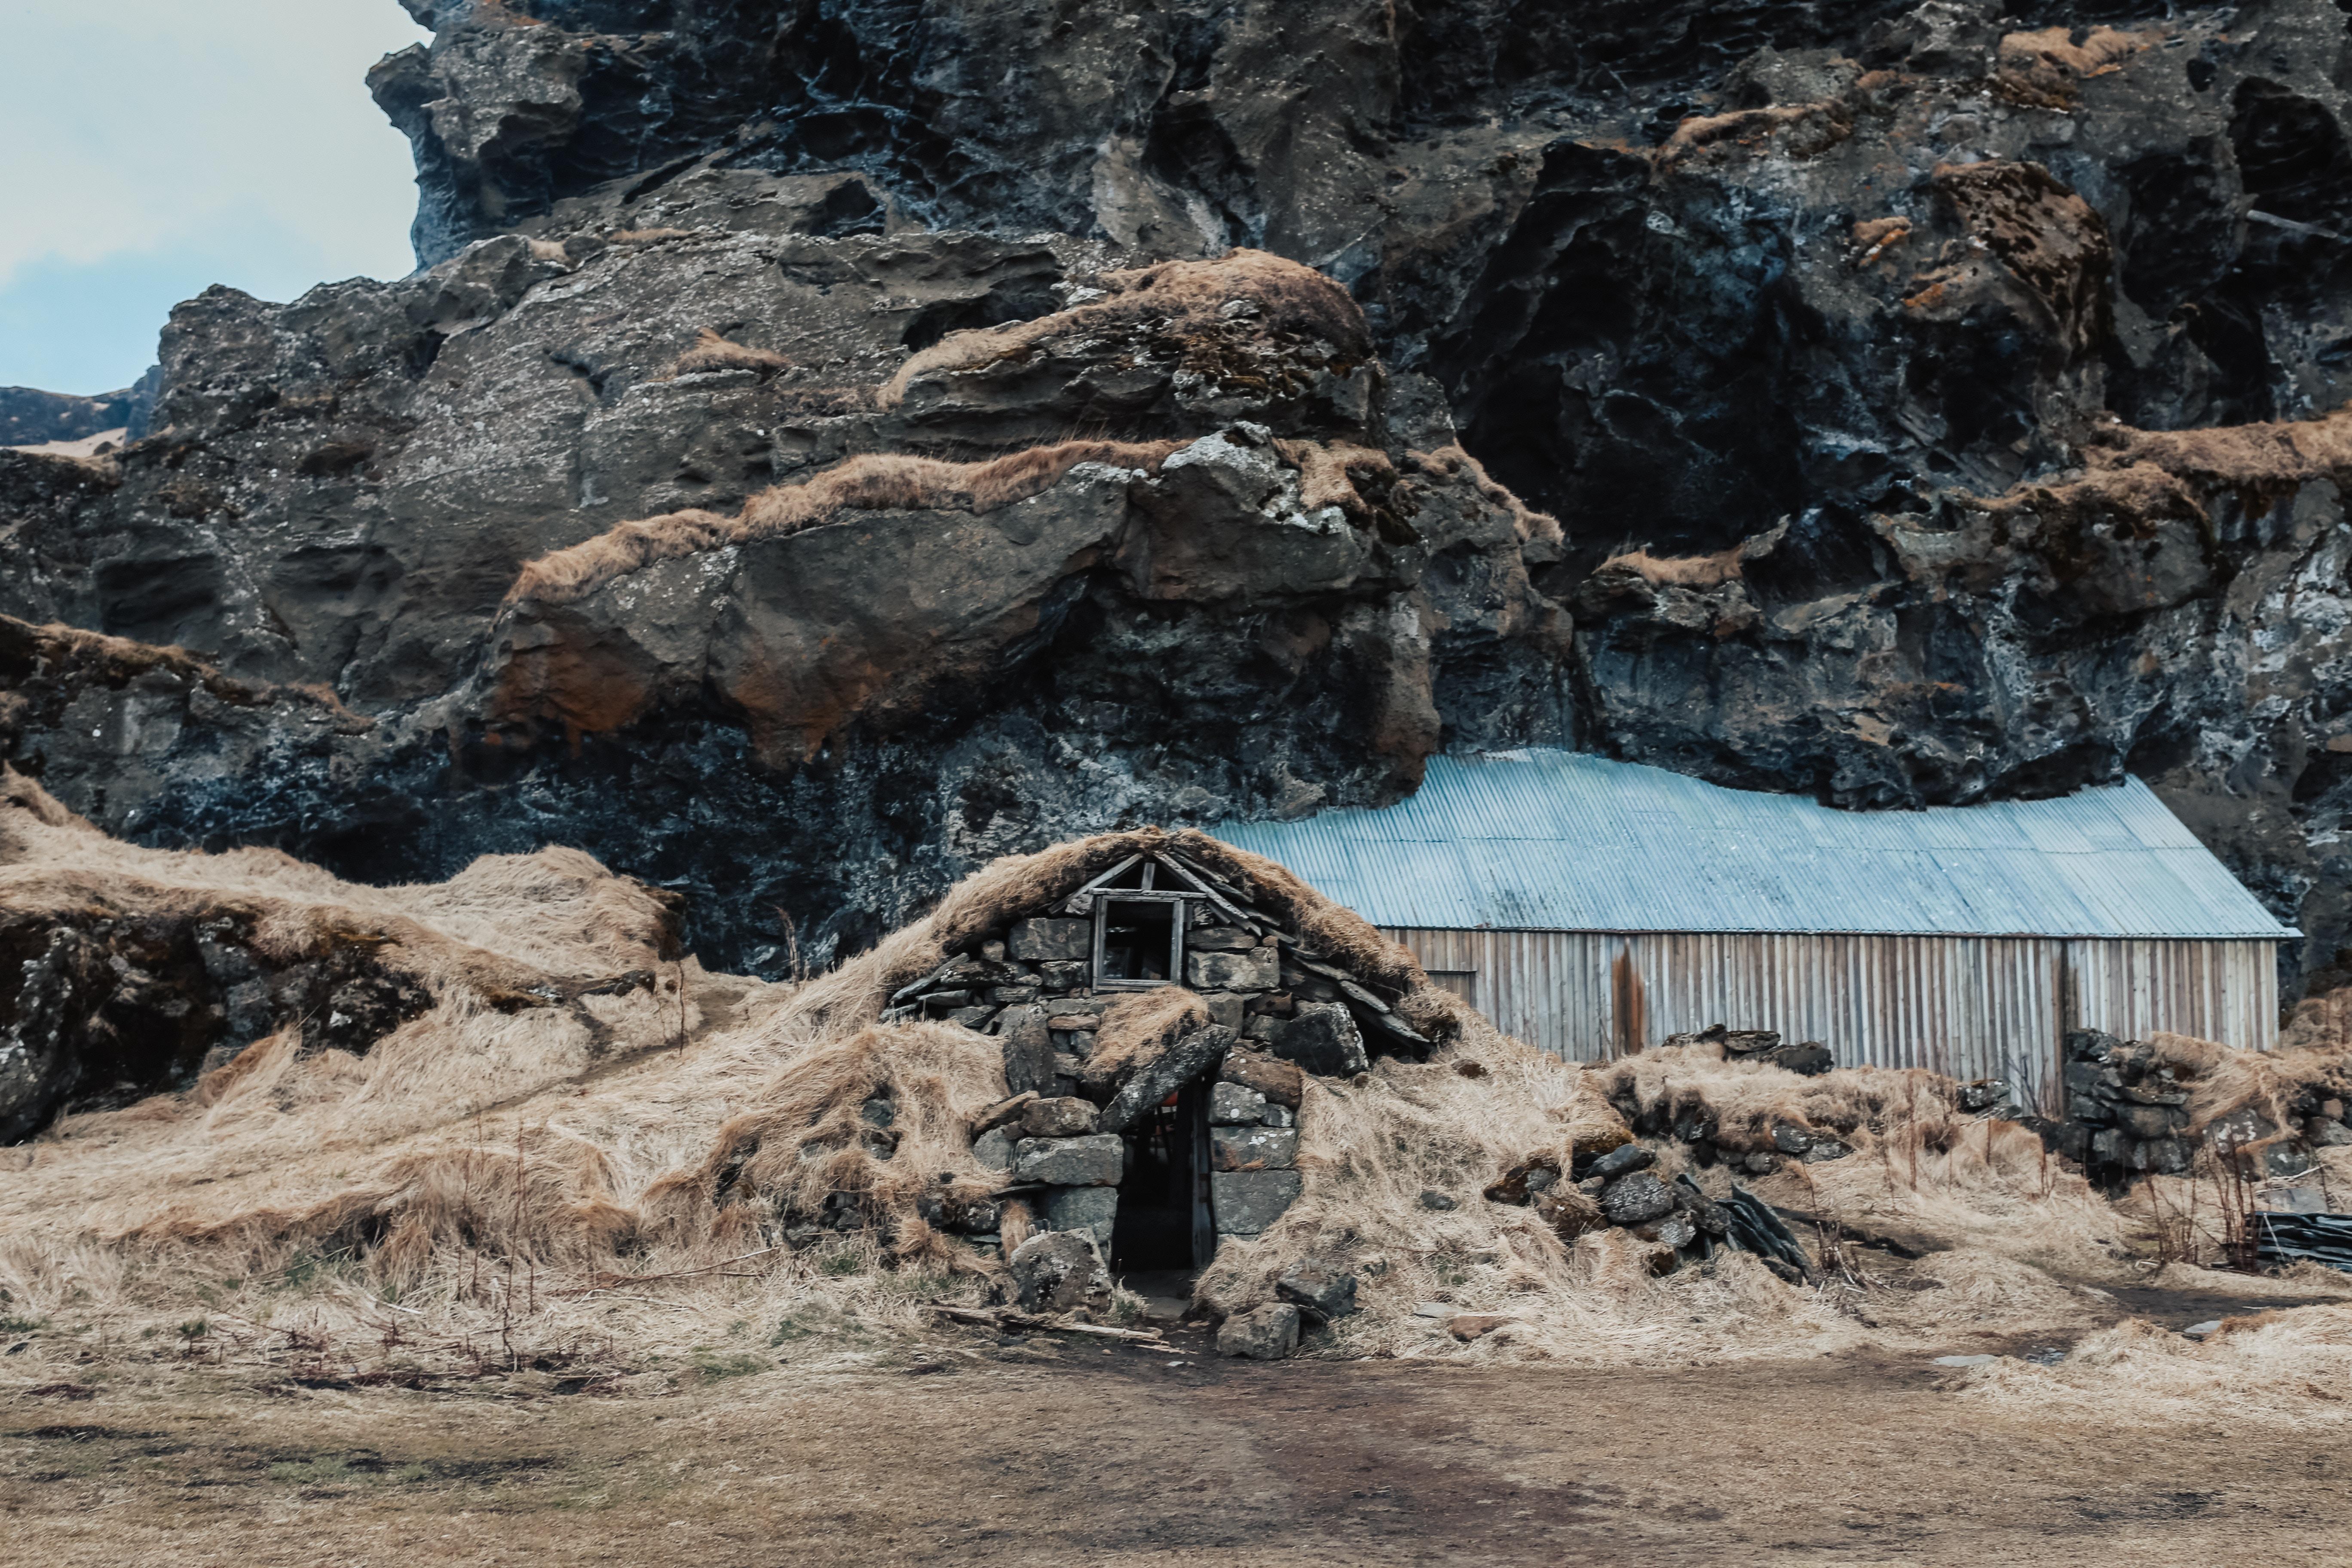 Troll house in Iceland near Vik